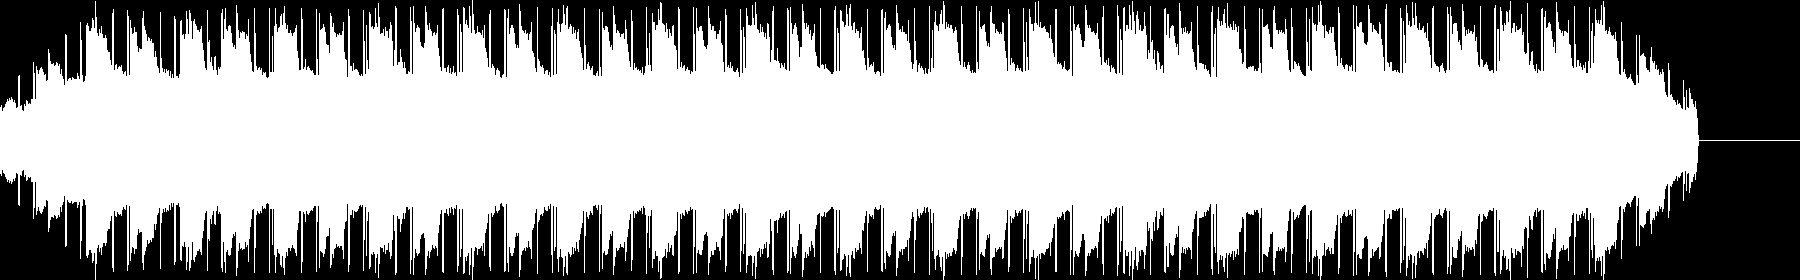 Persona audio waveform